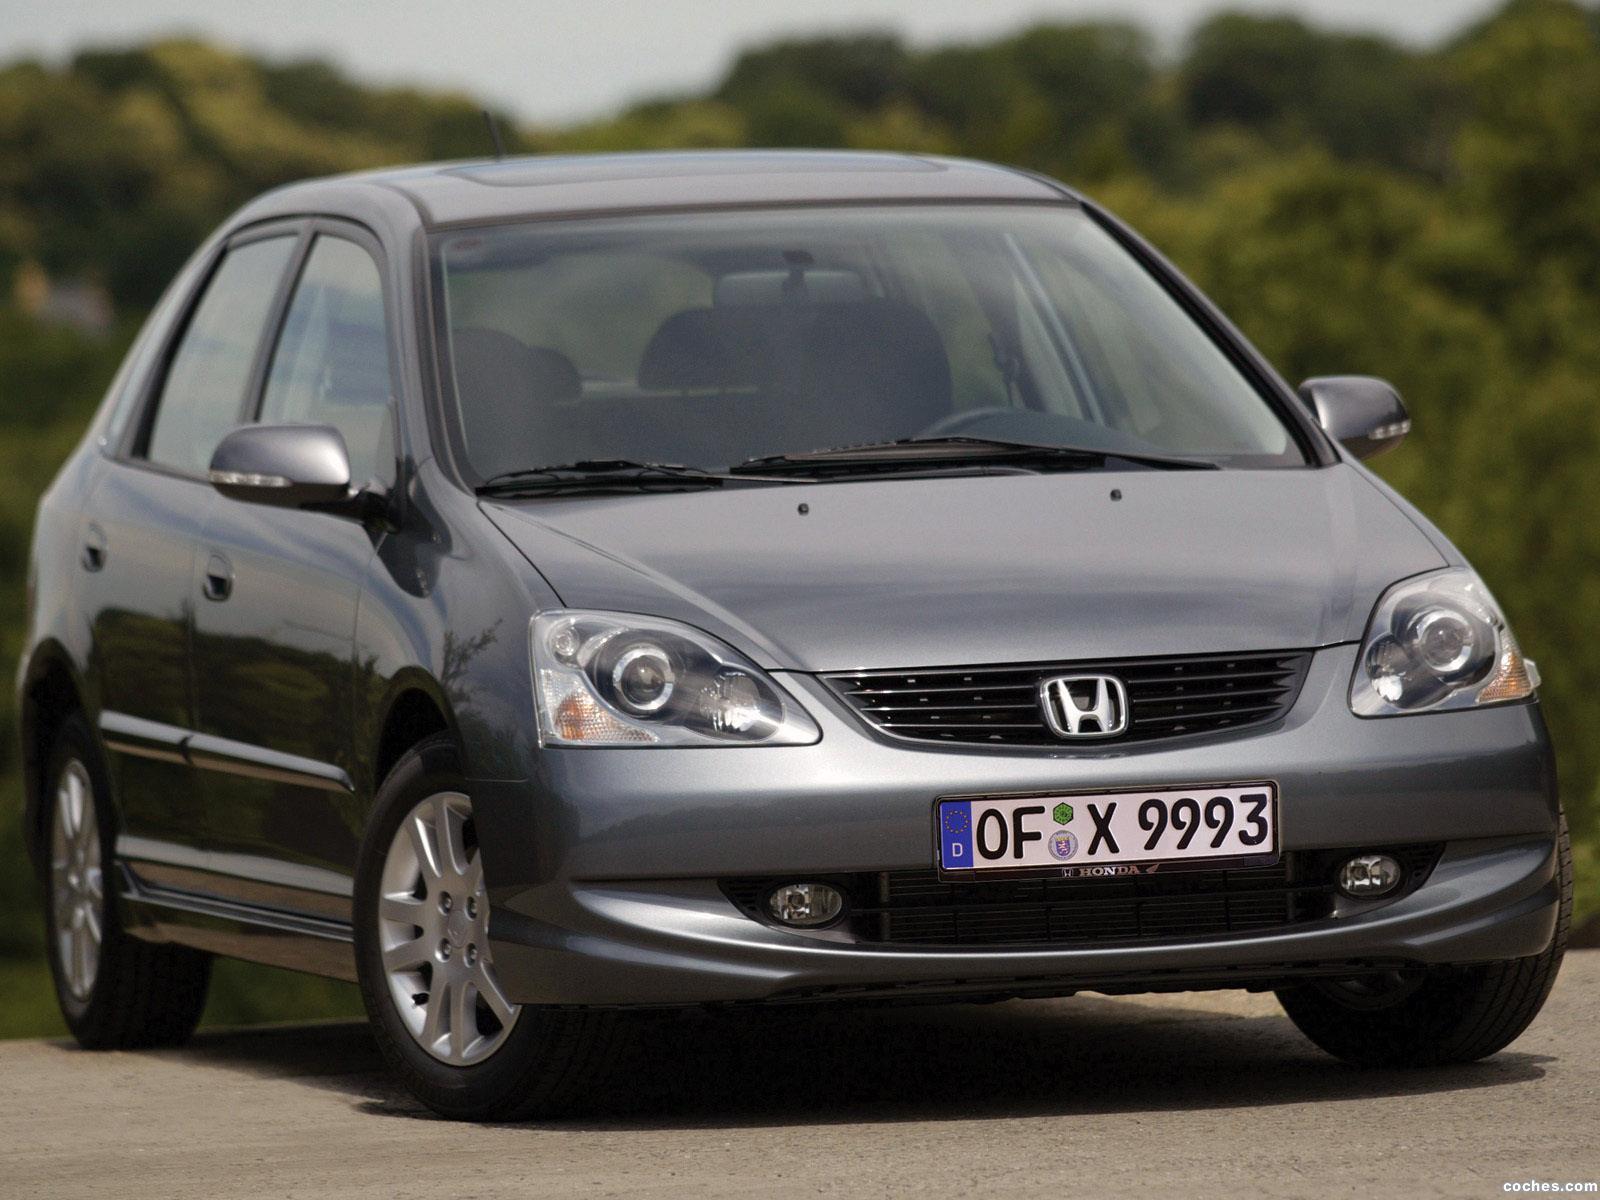 Fotos de Honda Civic 5 puertas 2003